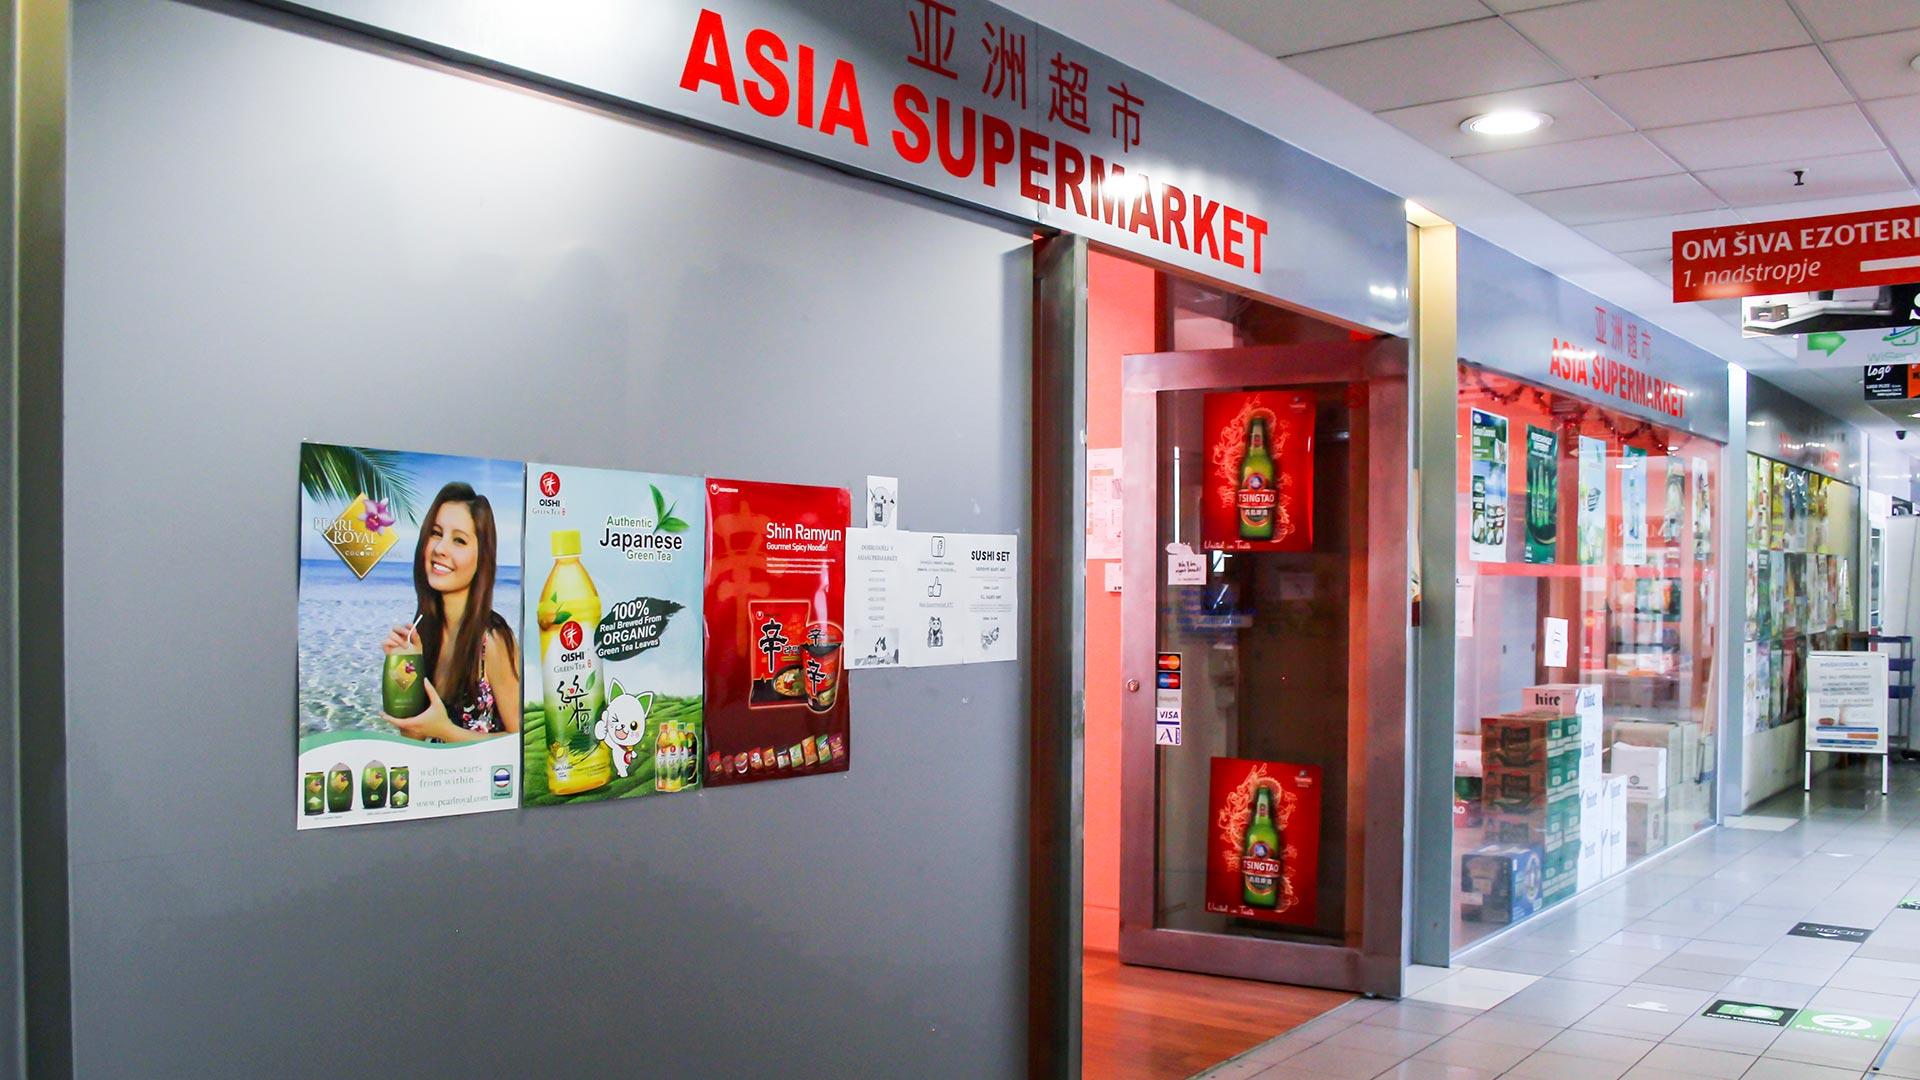 Asia Supermarket